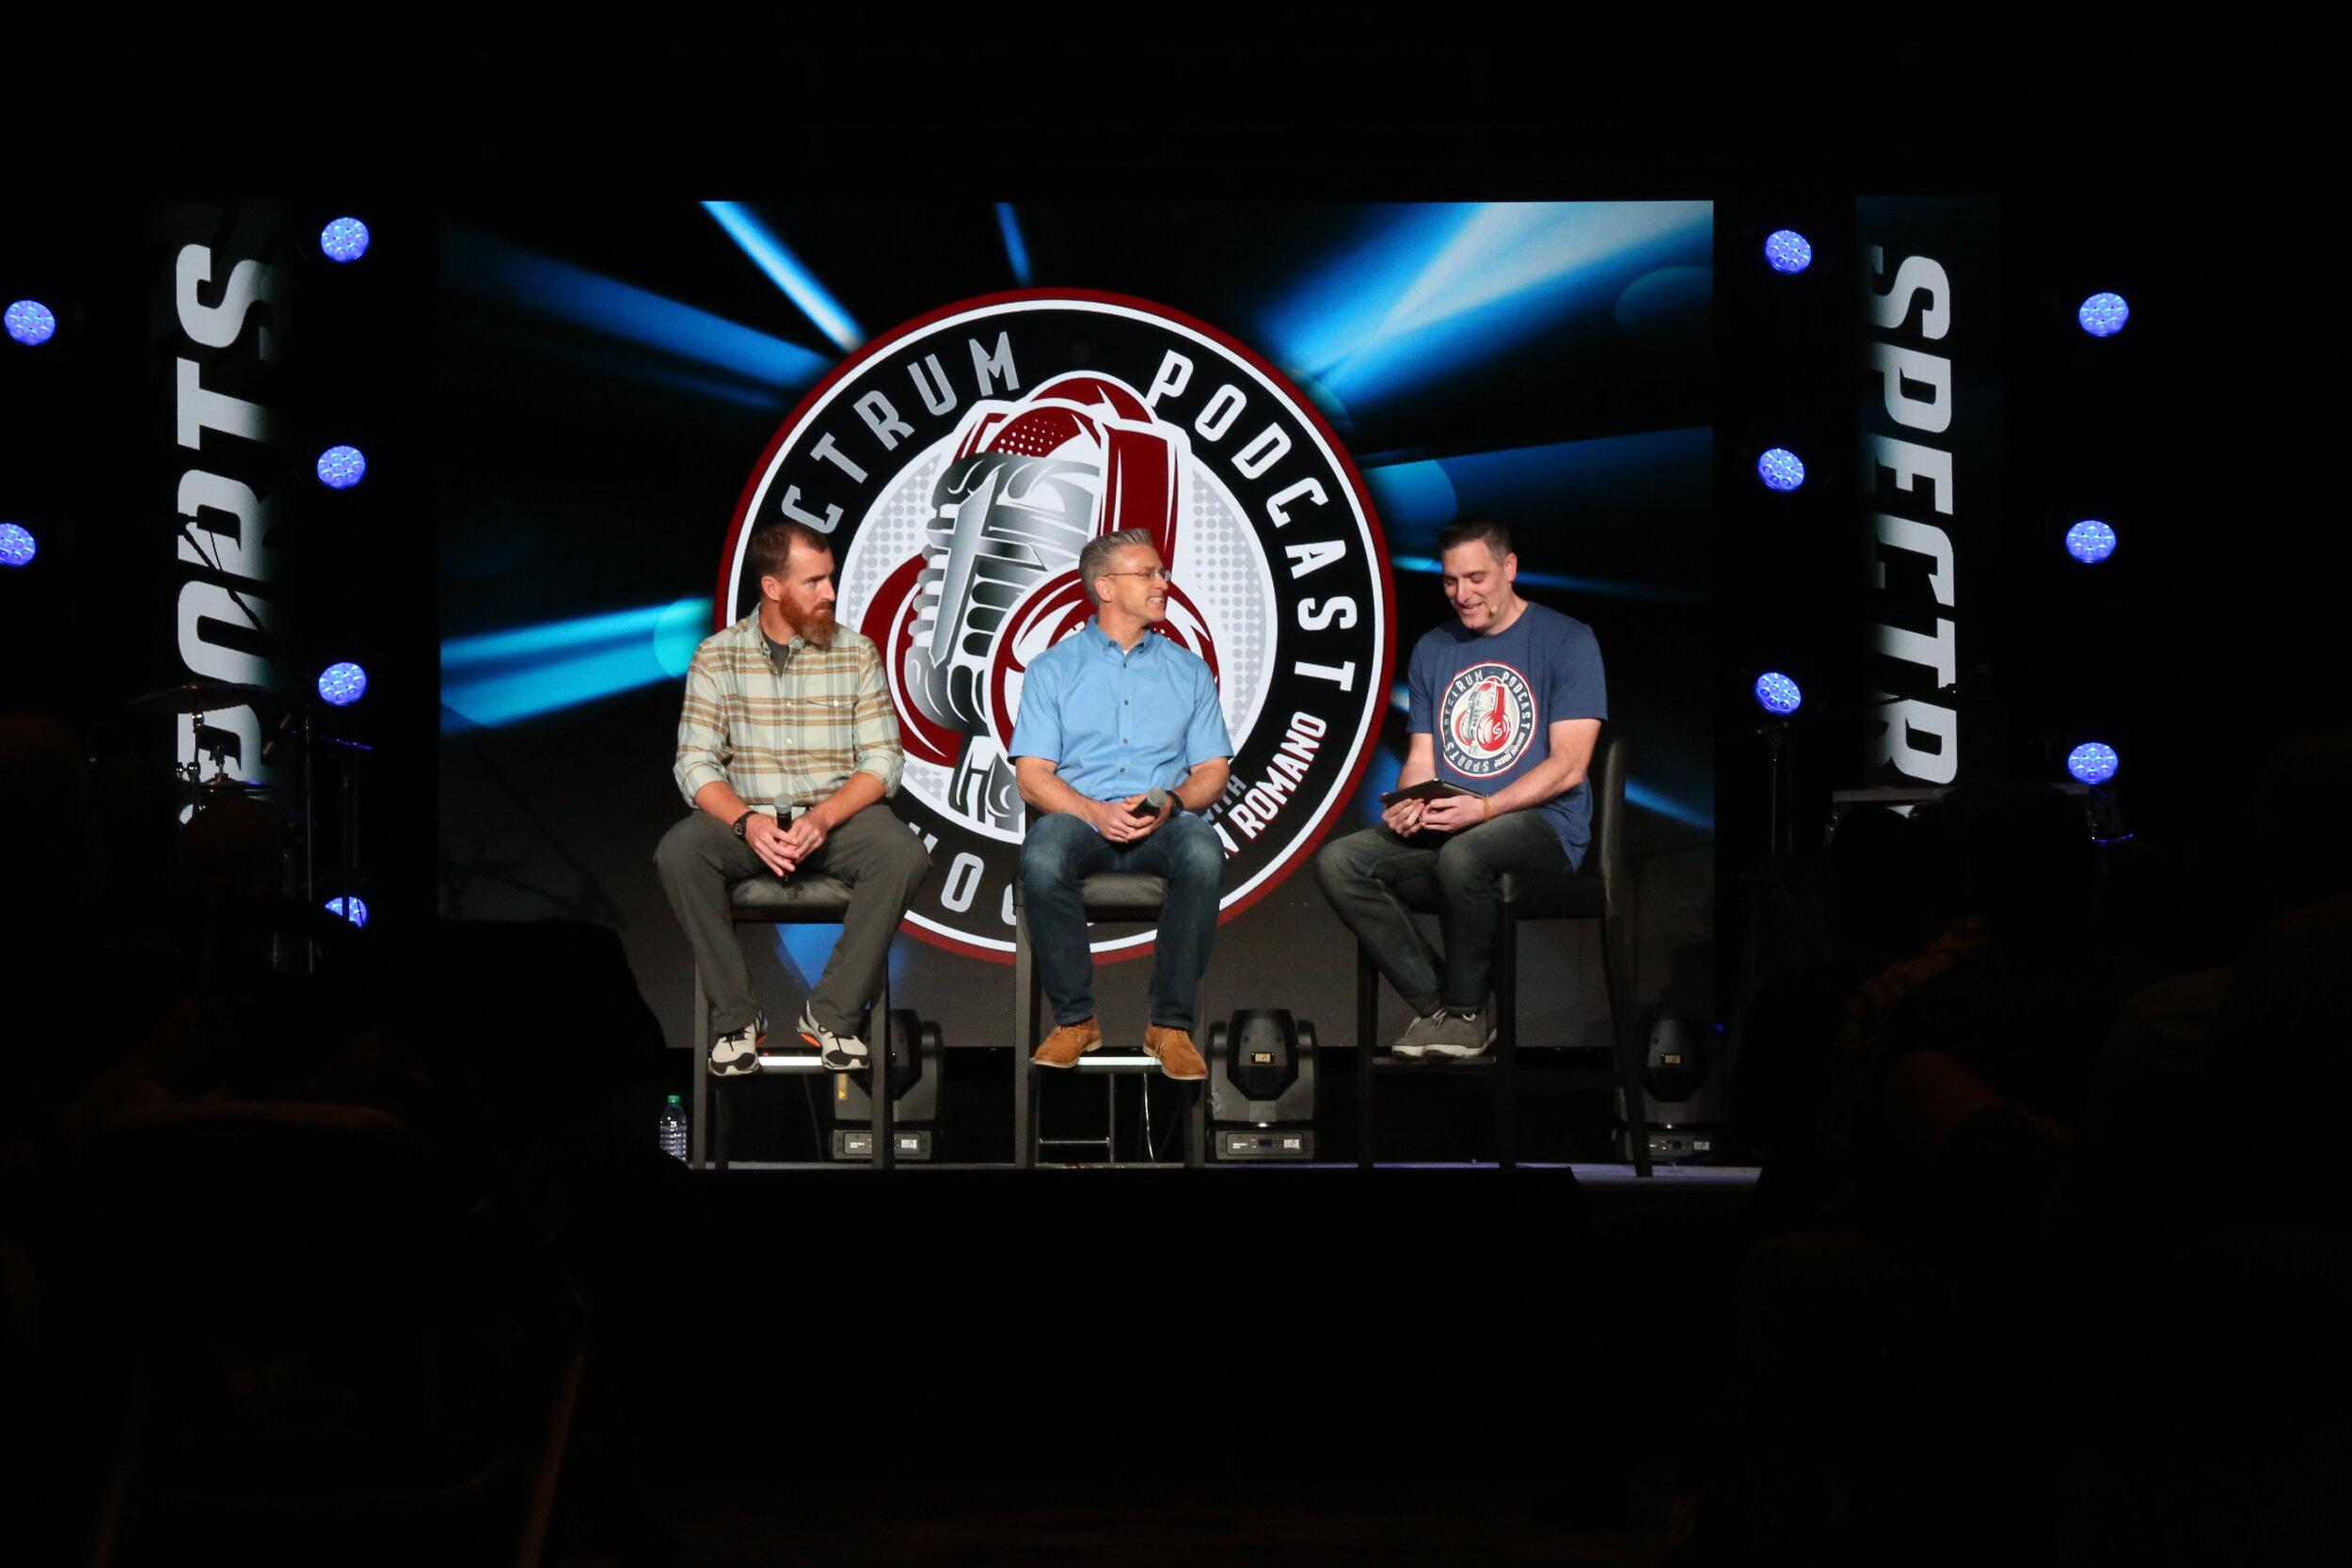 Jason interviewing former MLB player Adam LaRoche and IJM Founder Gary Haugen